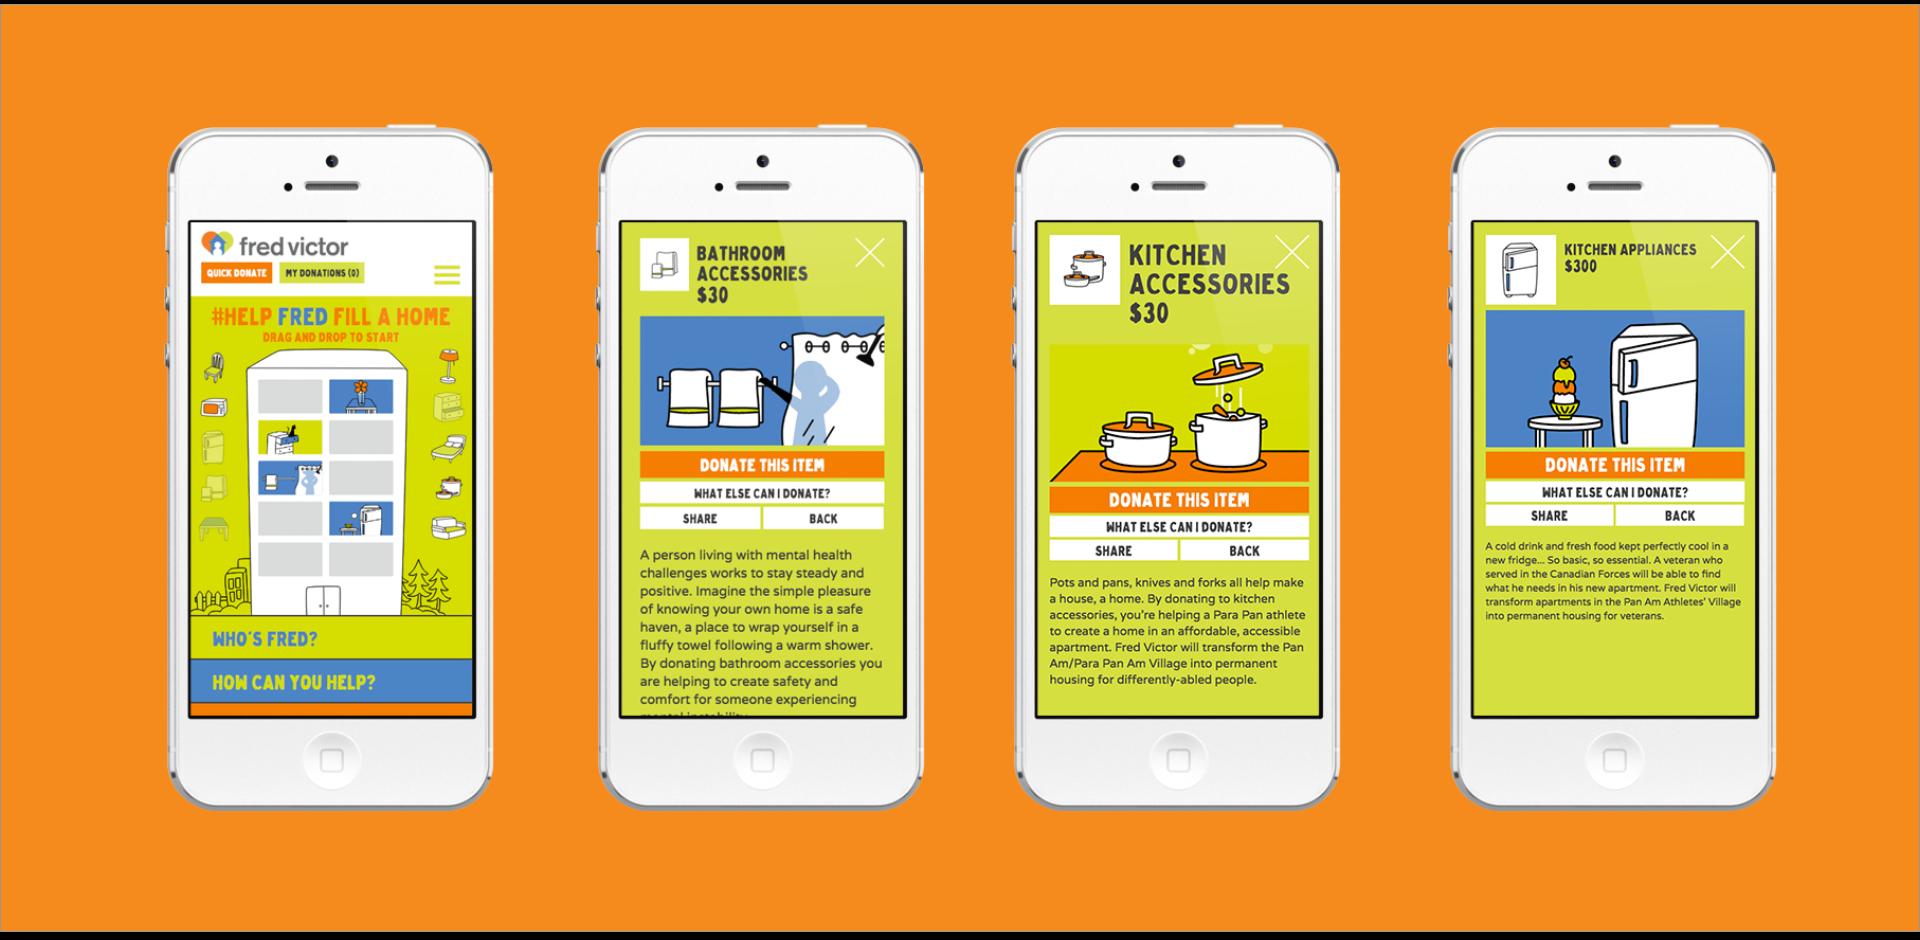 #HelpFredFillAHome - Digital Campaign - Mobile Set